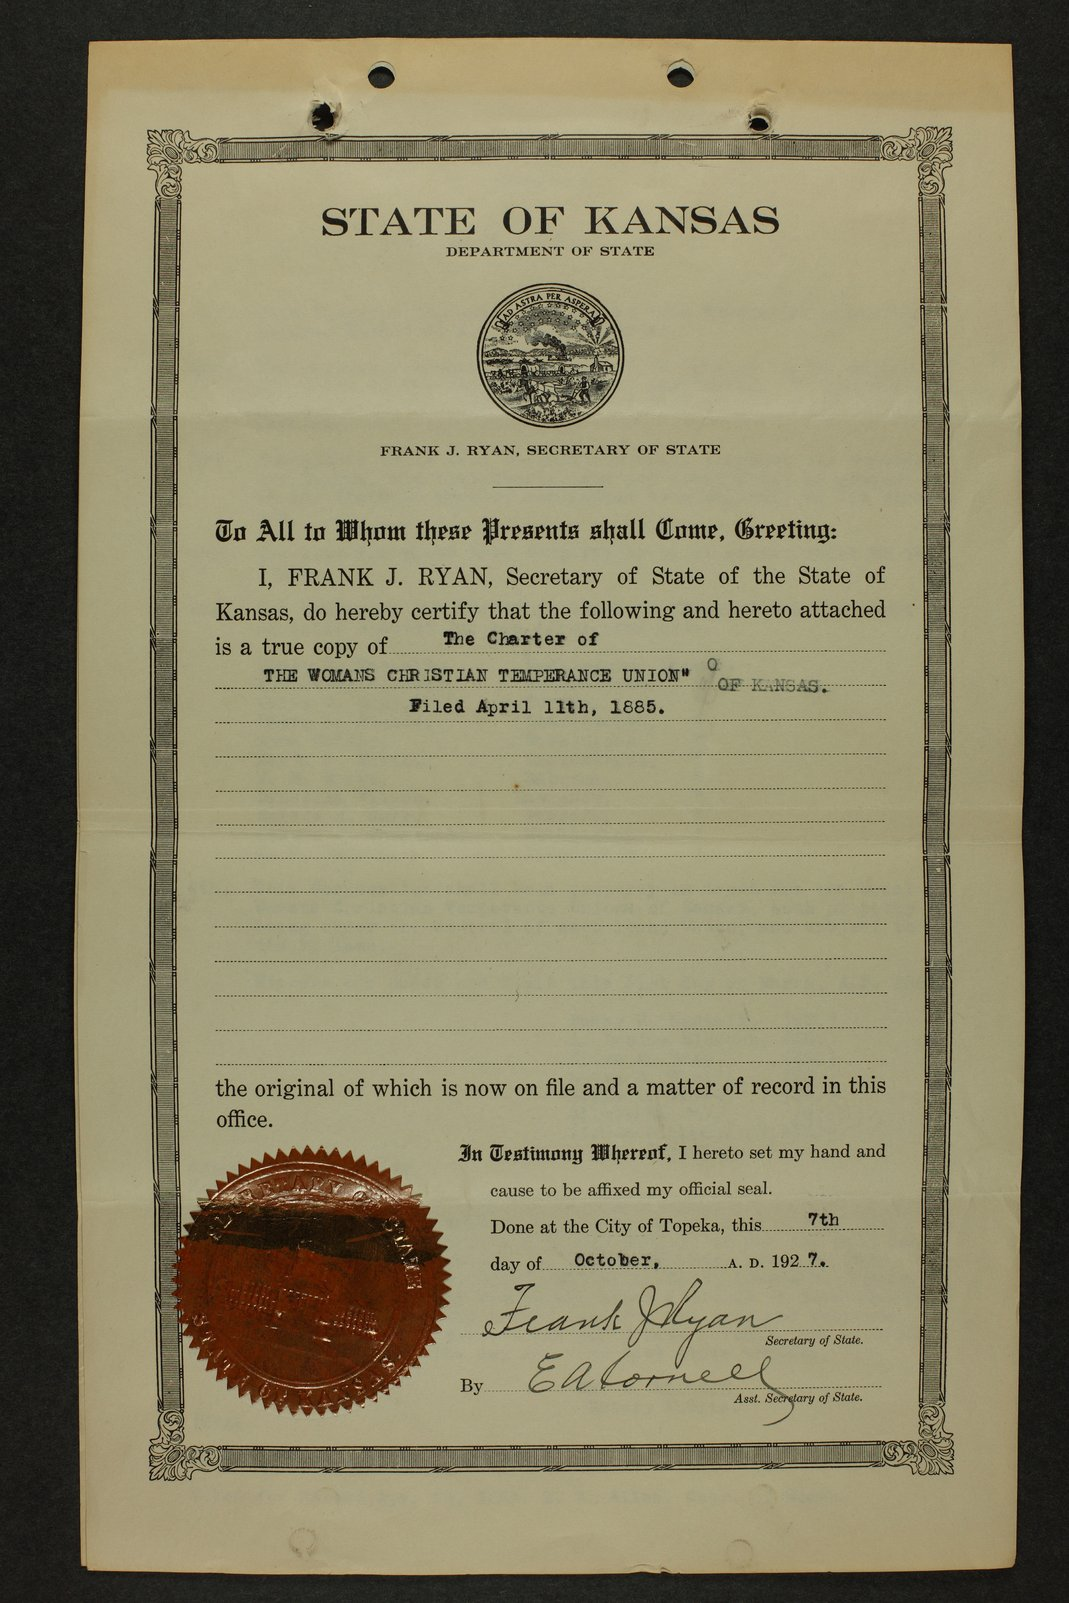 Kansas Woman's Christian Temperance Union permanent records - 1 [Box 5, Folder 1]